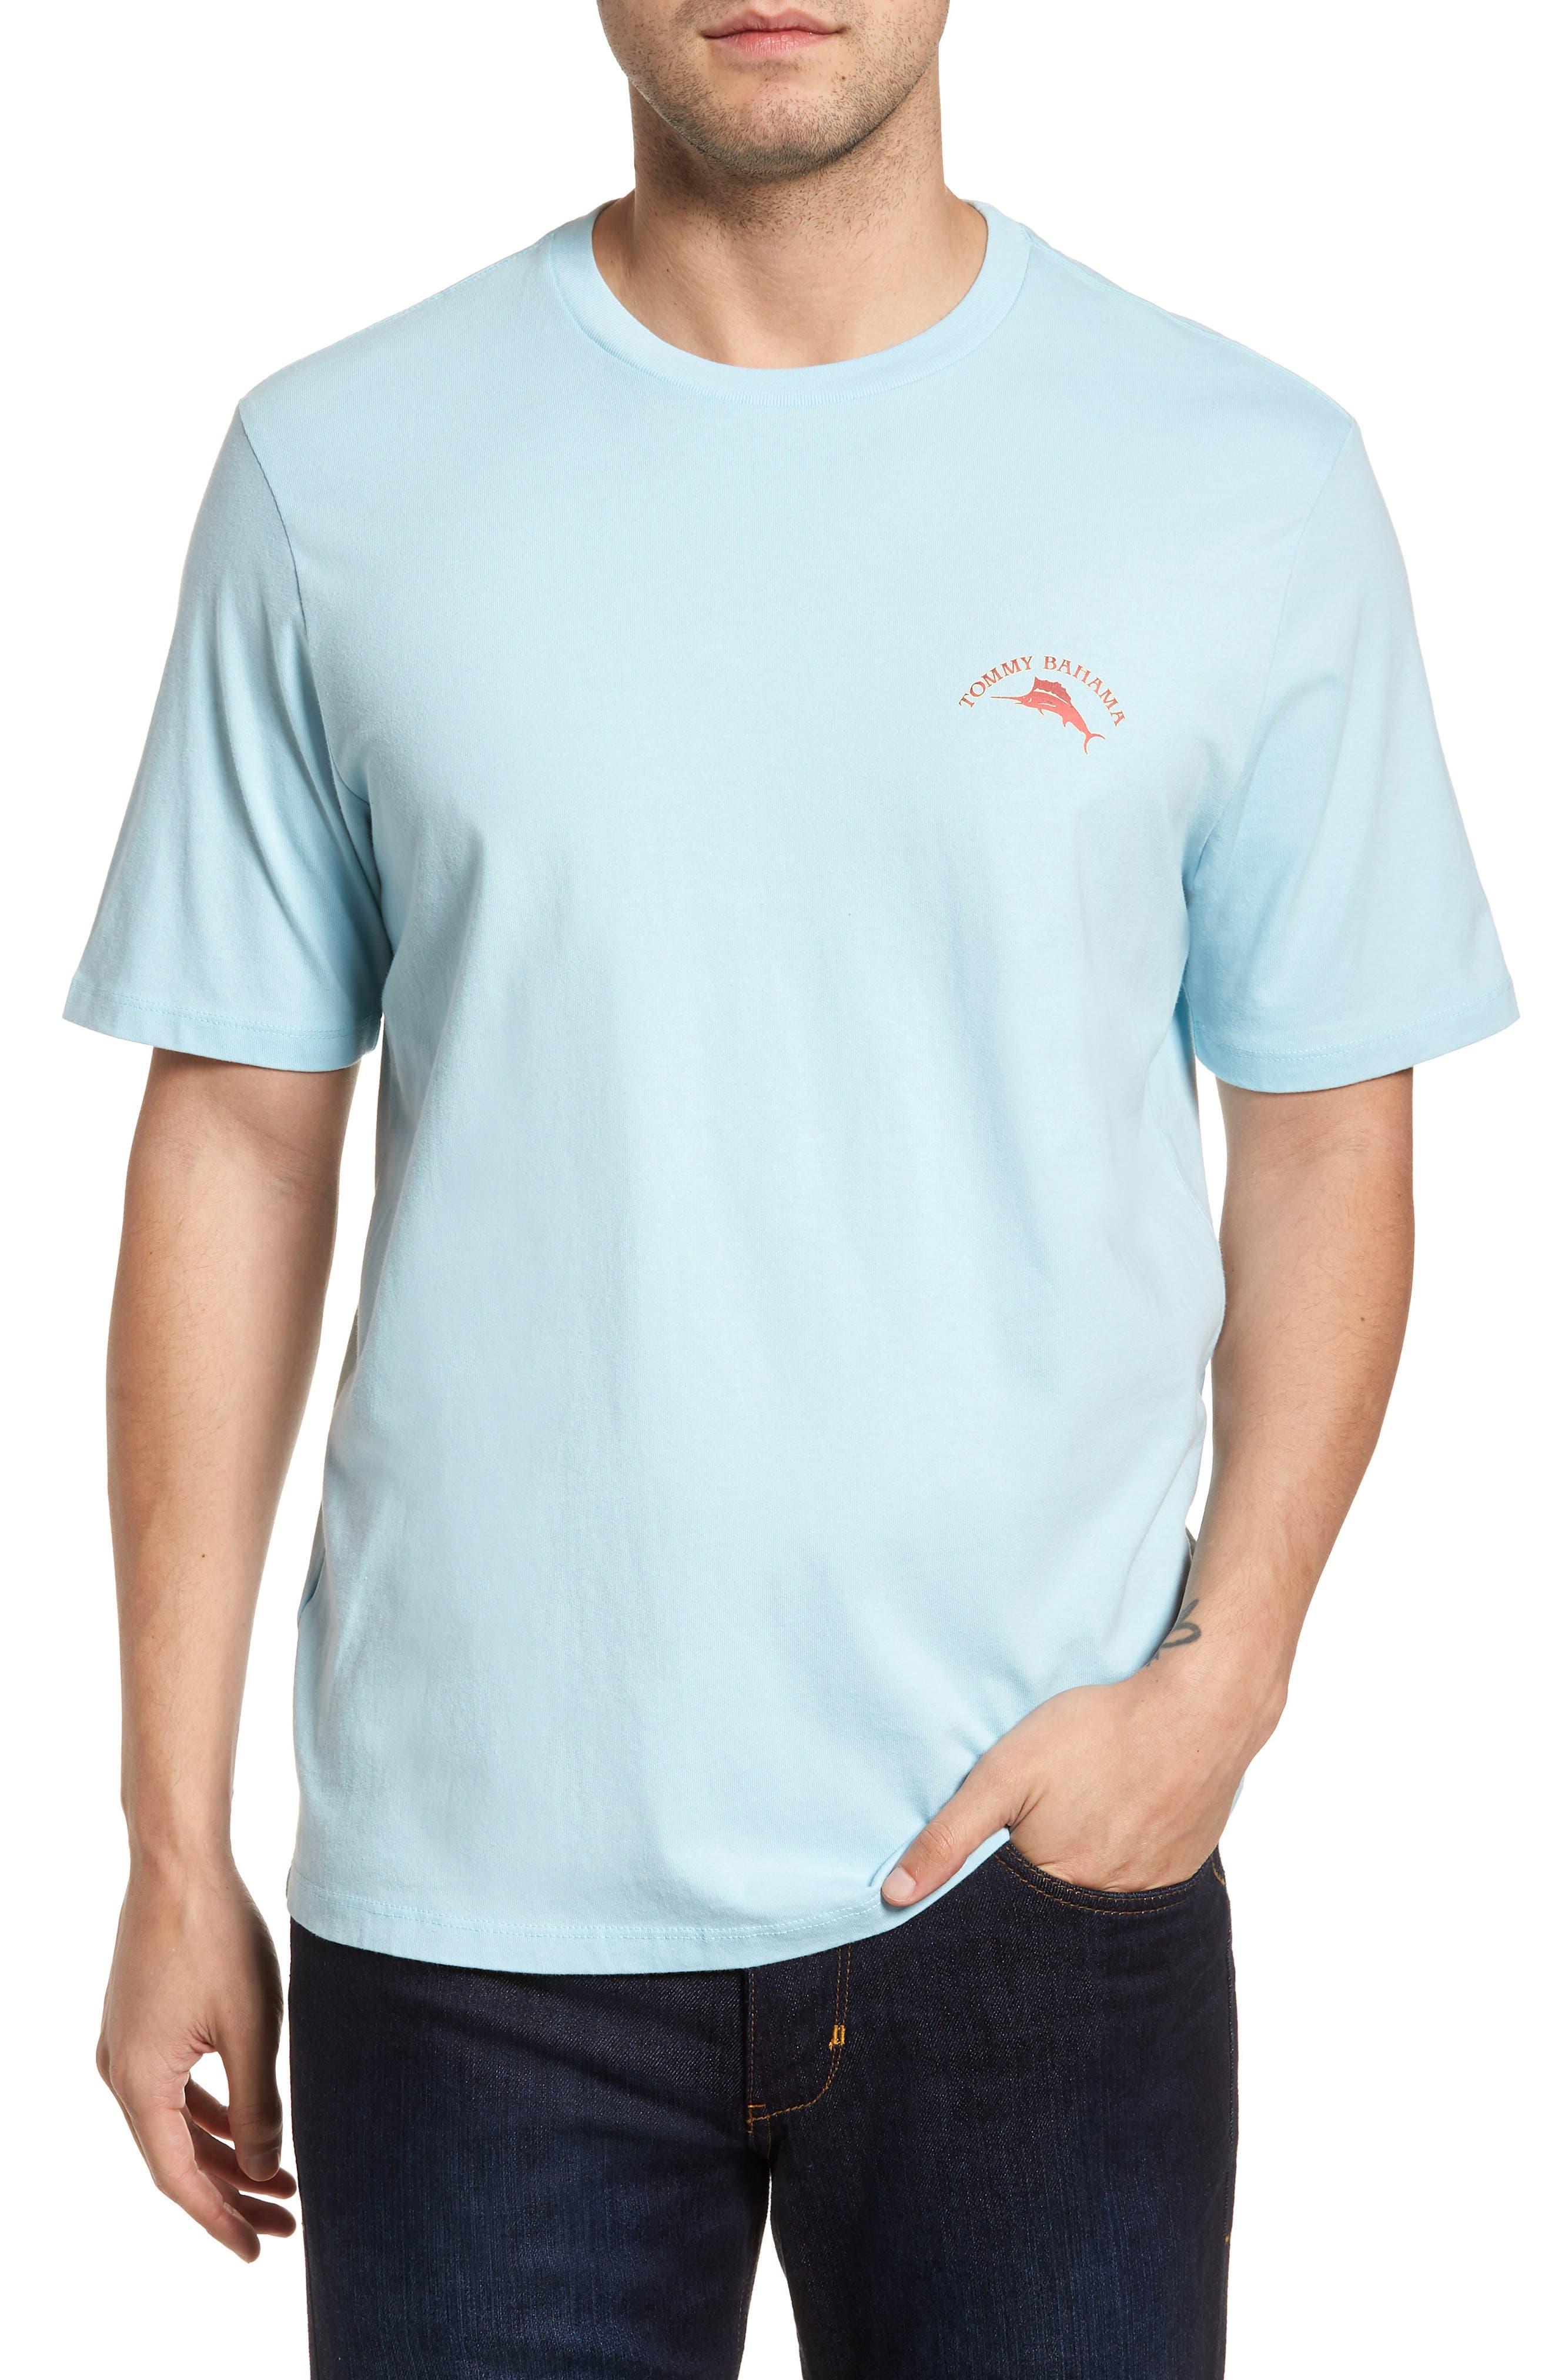 Zinspiration T-Shirt,                         Main,                         color, Opal